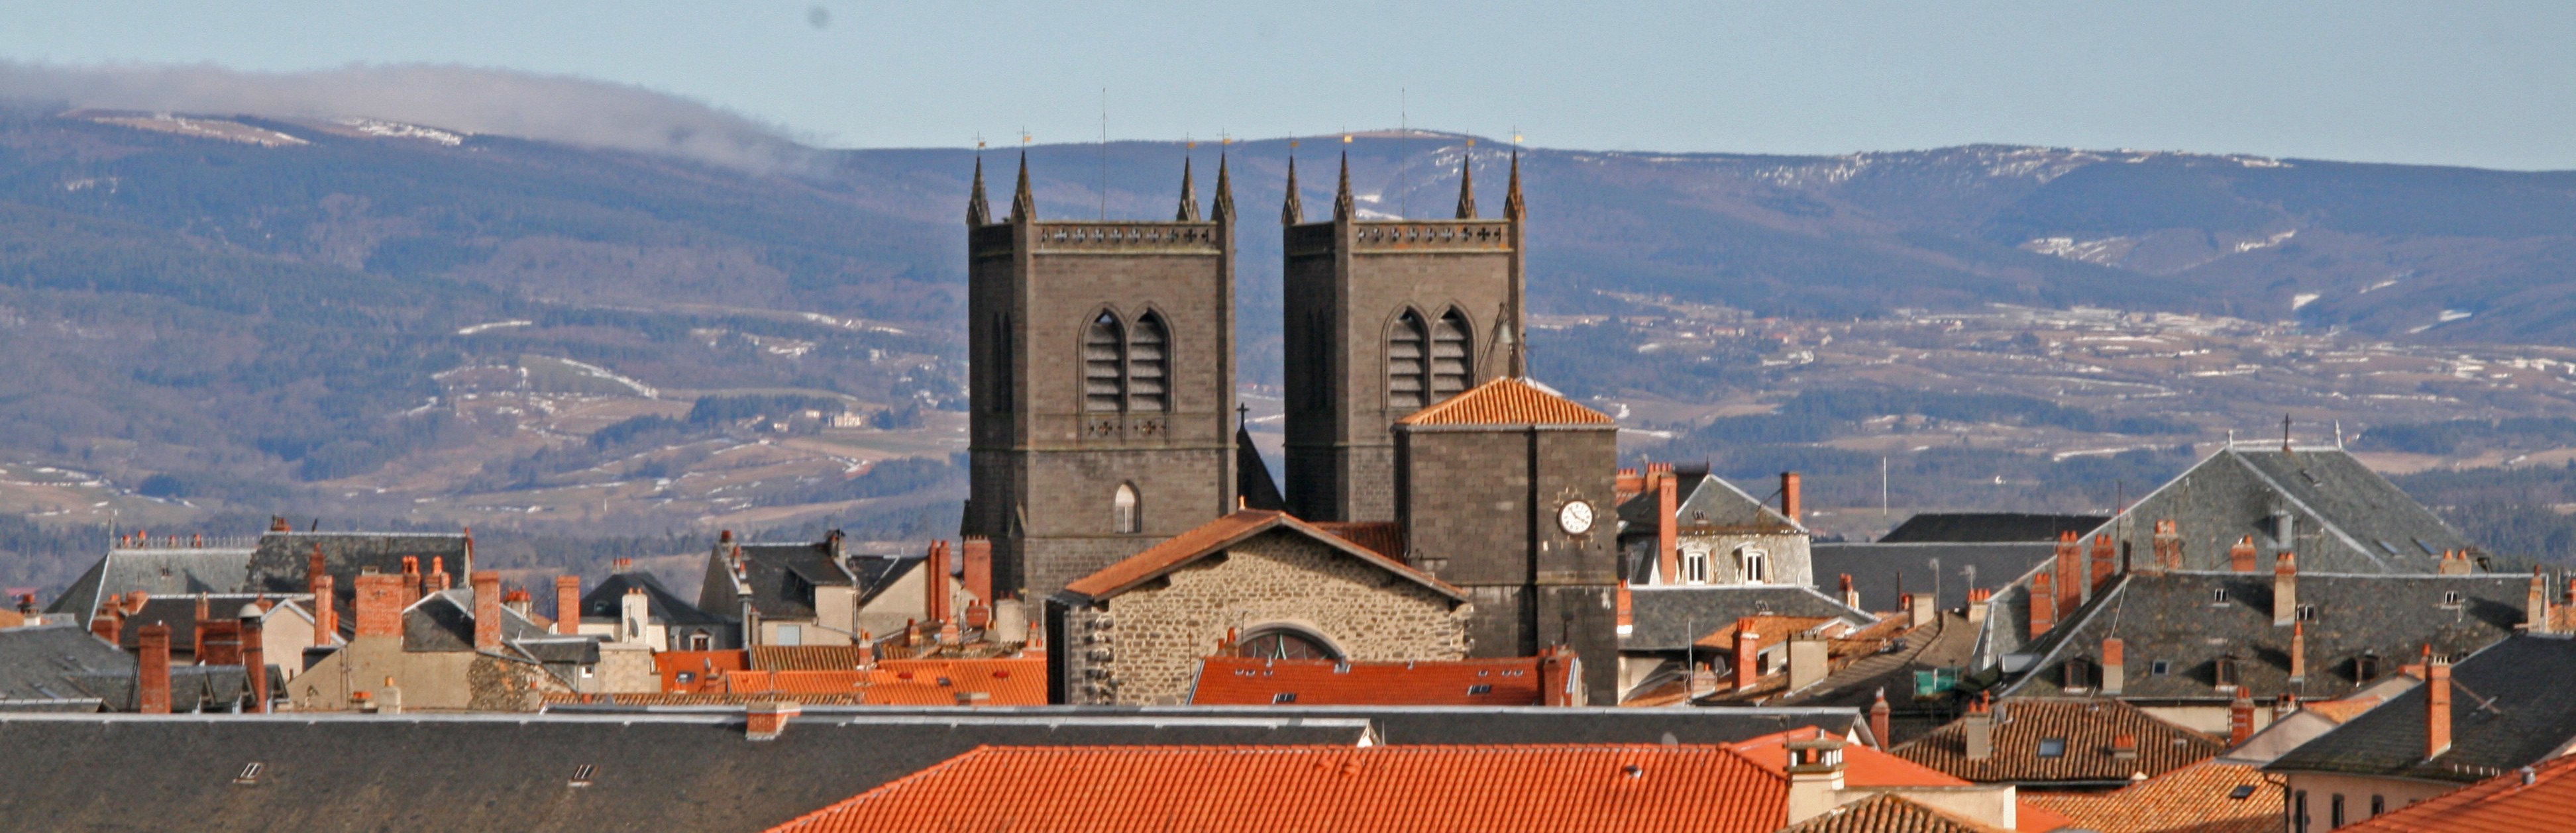 urbanisme SPR saint flour cathédrale